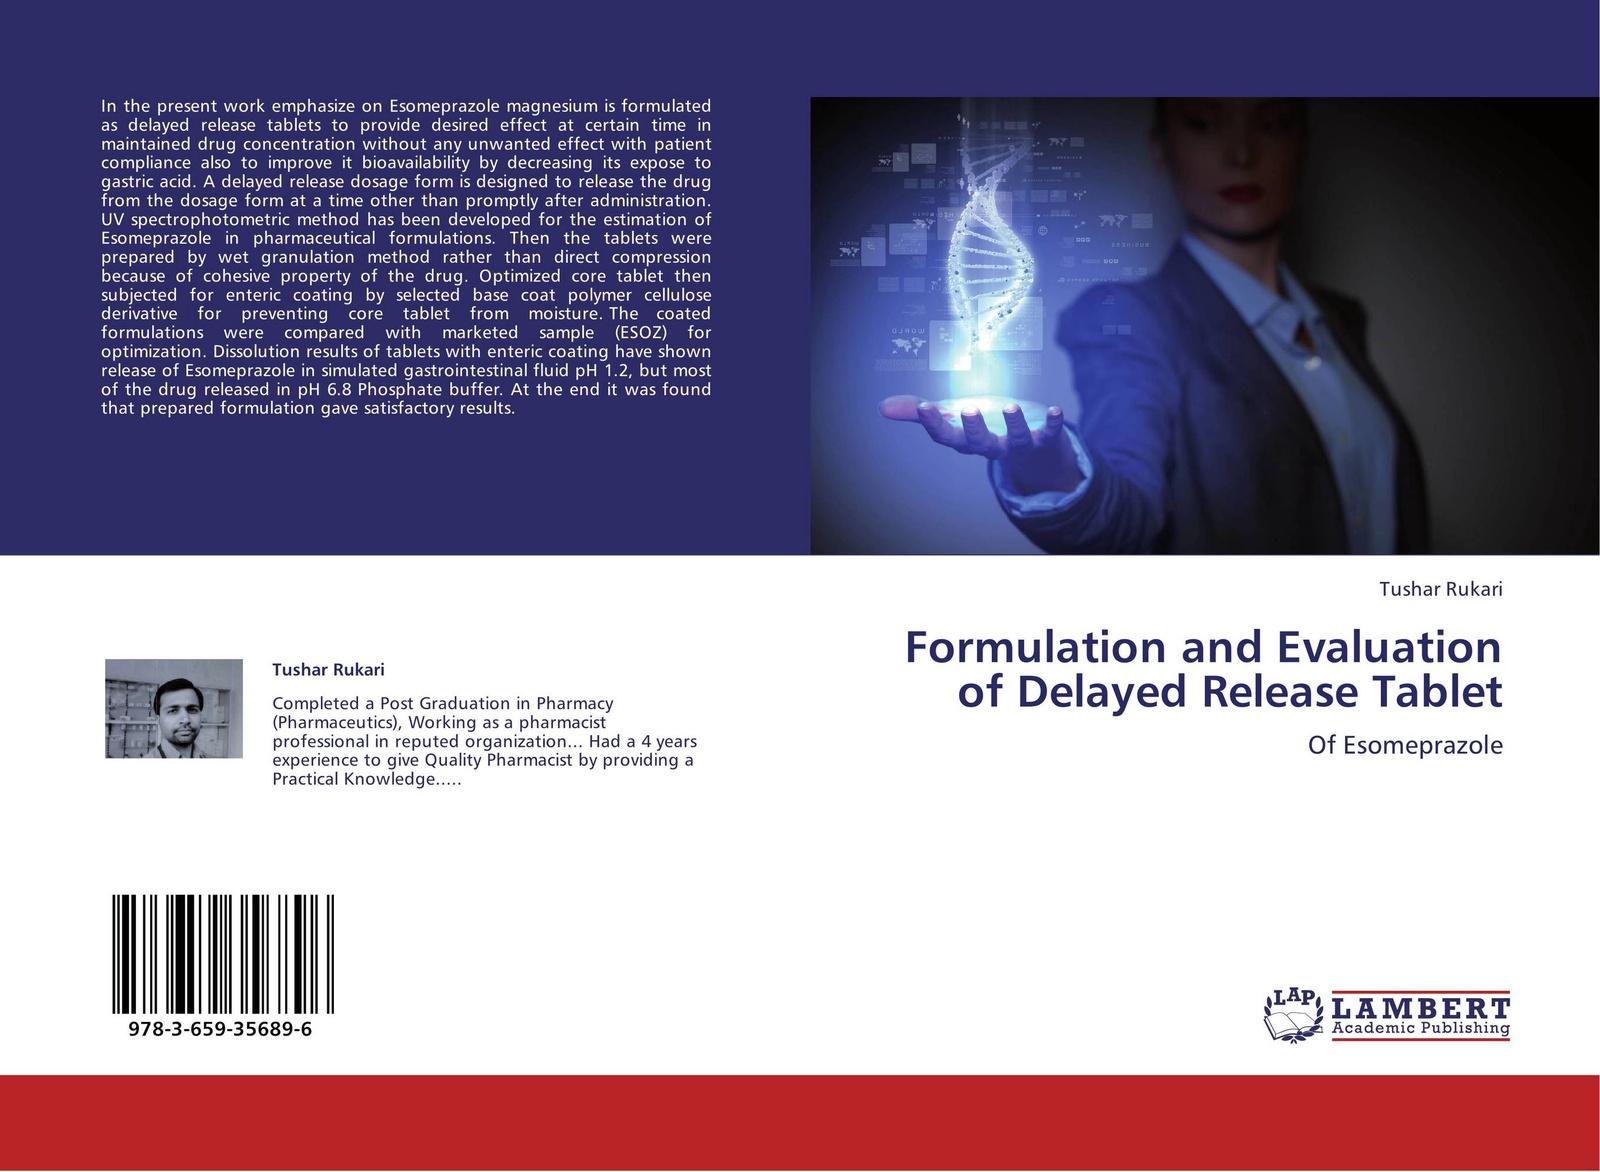 Tushar Rukari Formulation and Evaluation of Delayed Release Tablet formulation and evaluation of amlodipine besylate tablets